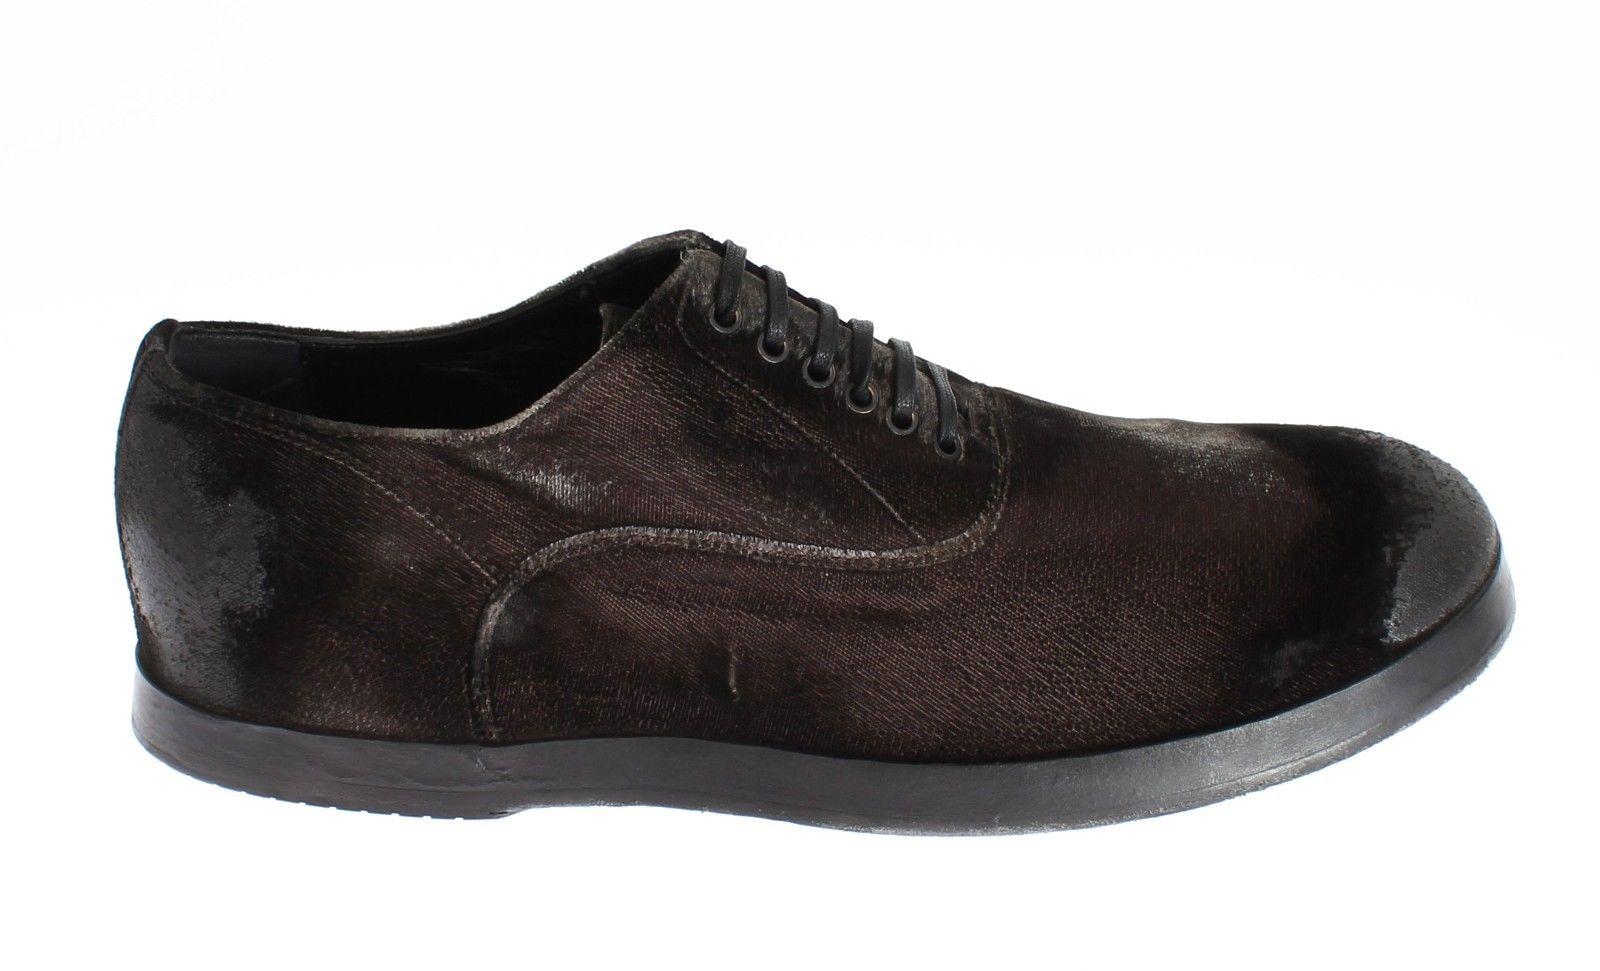 Dolce & Gabbana Men's Casual Laceups Oxford Shoe Brown SIG11073 - EU40.5/US7.5